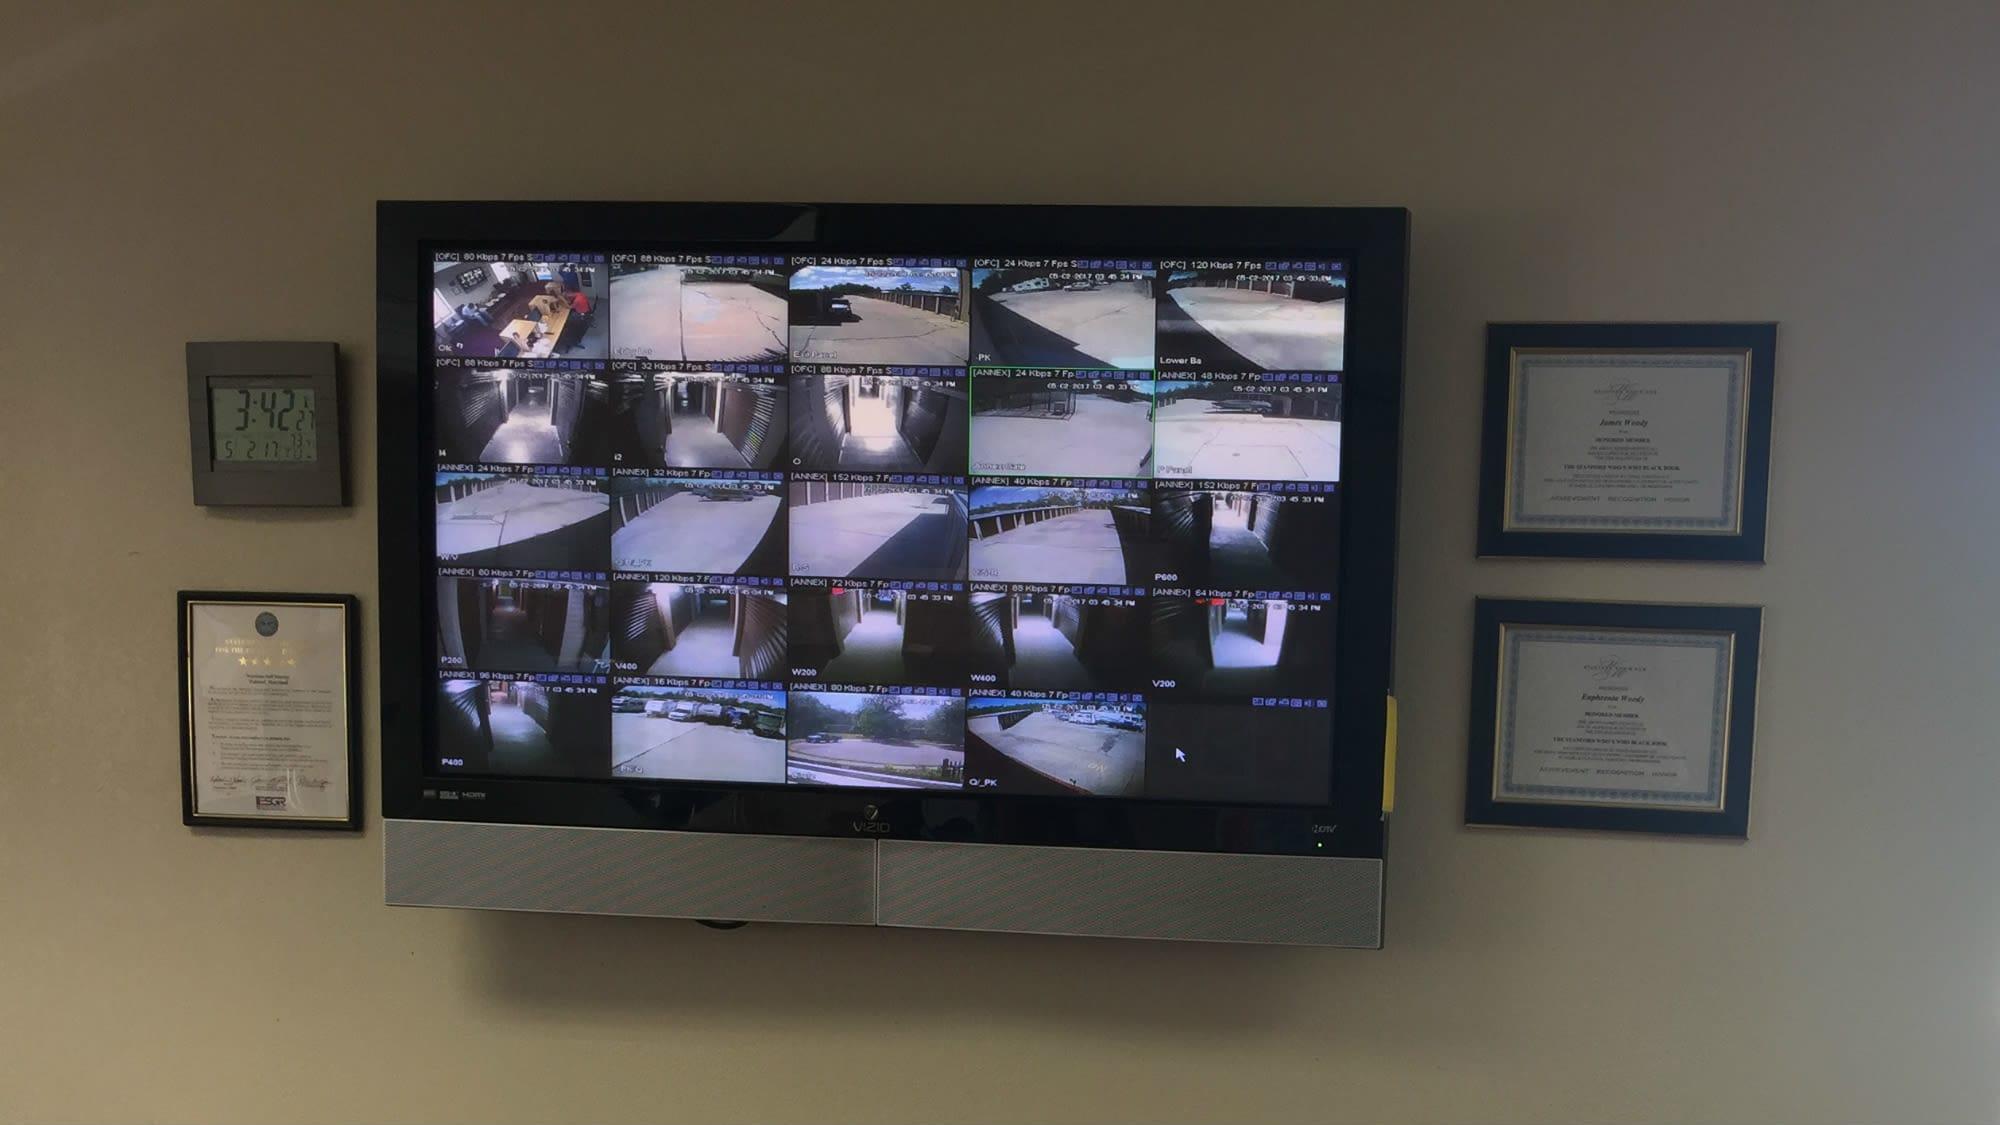 Security monitor at Westlake Self Storage in Waldorf, MD